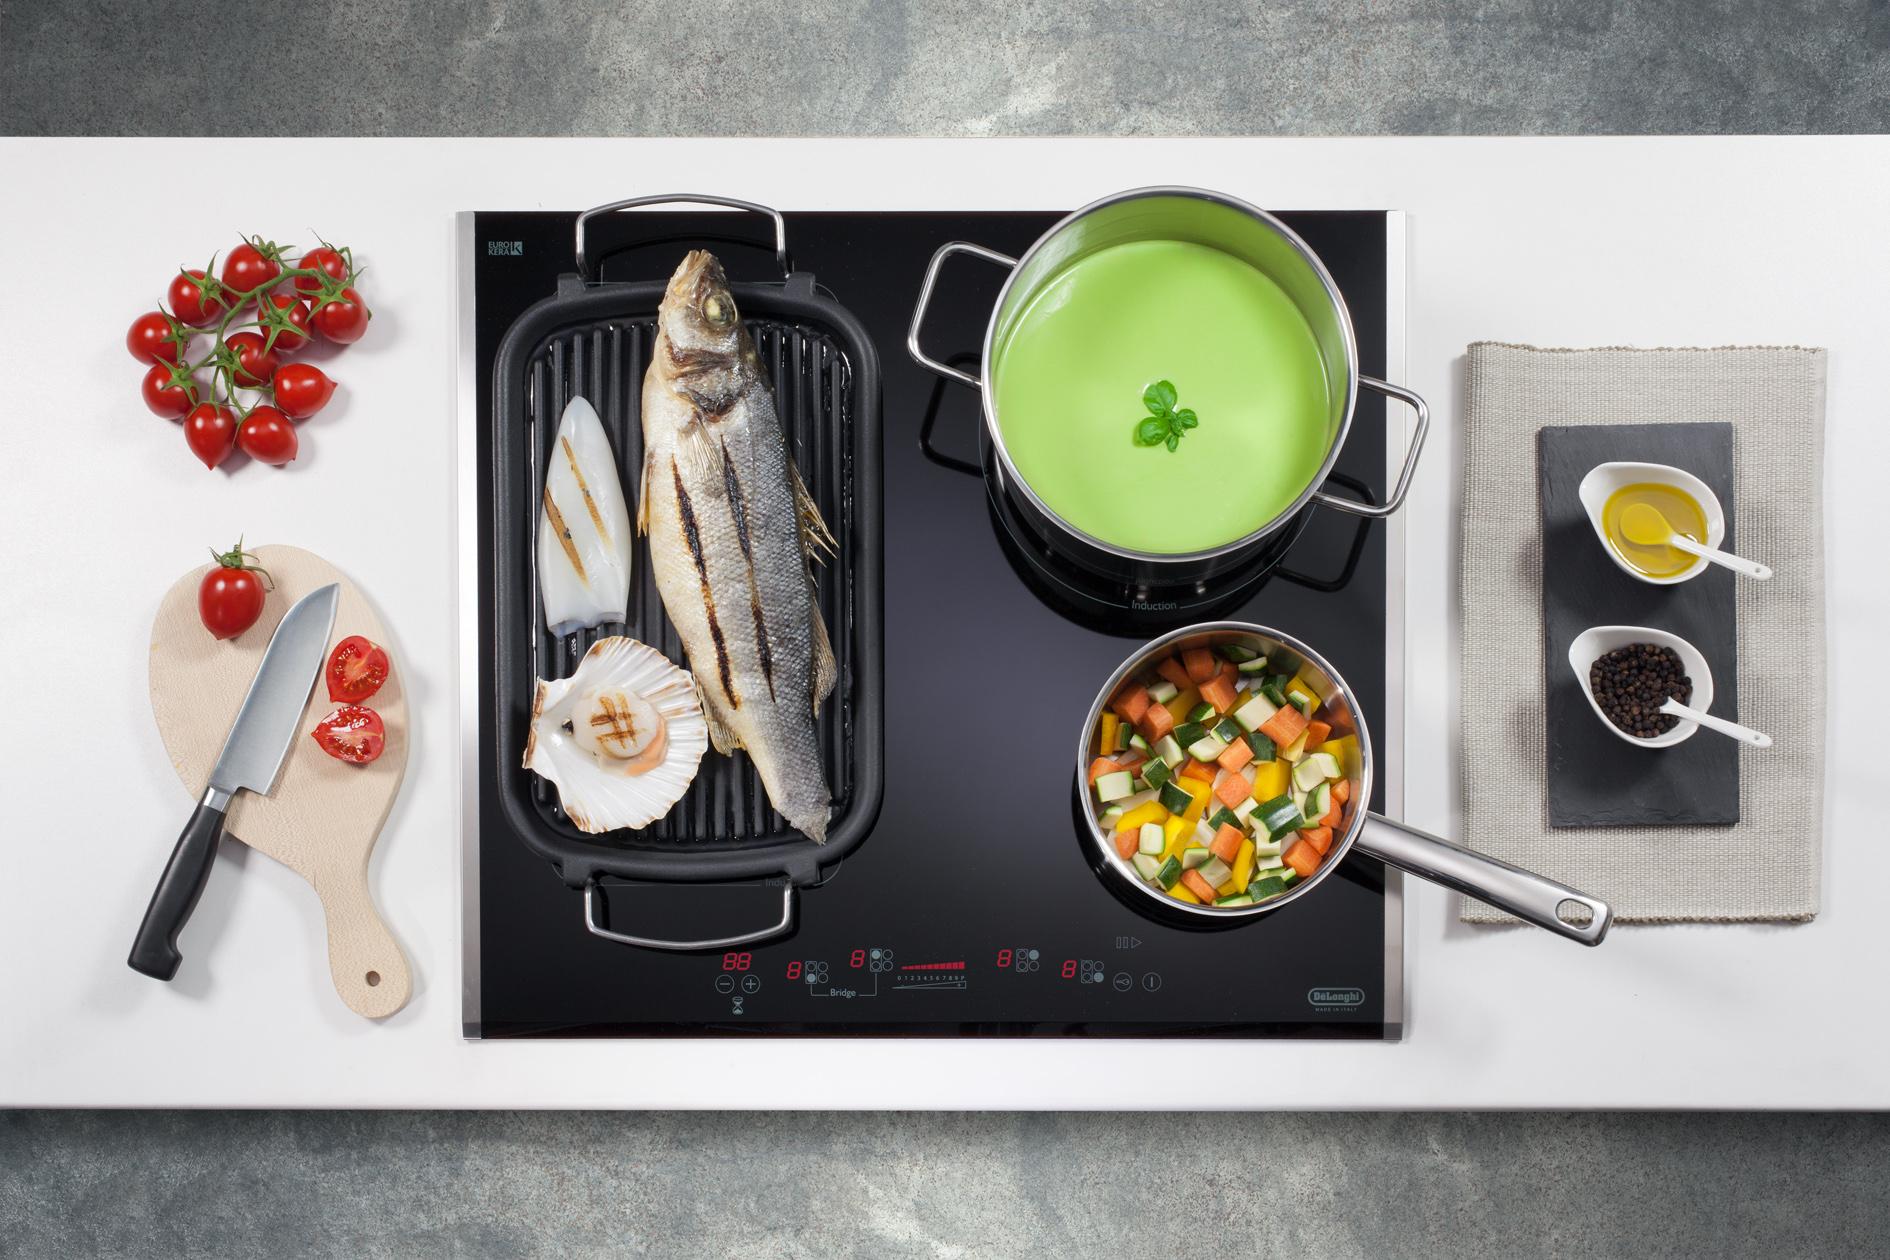 Pin 64 tc de 39 longhi cookers - Piastre elettriche a induzione ...